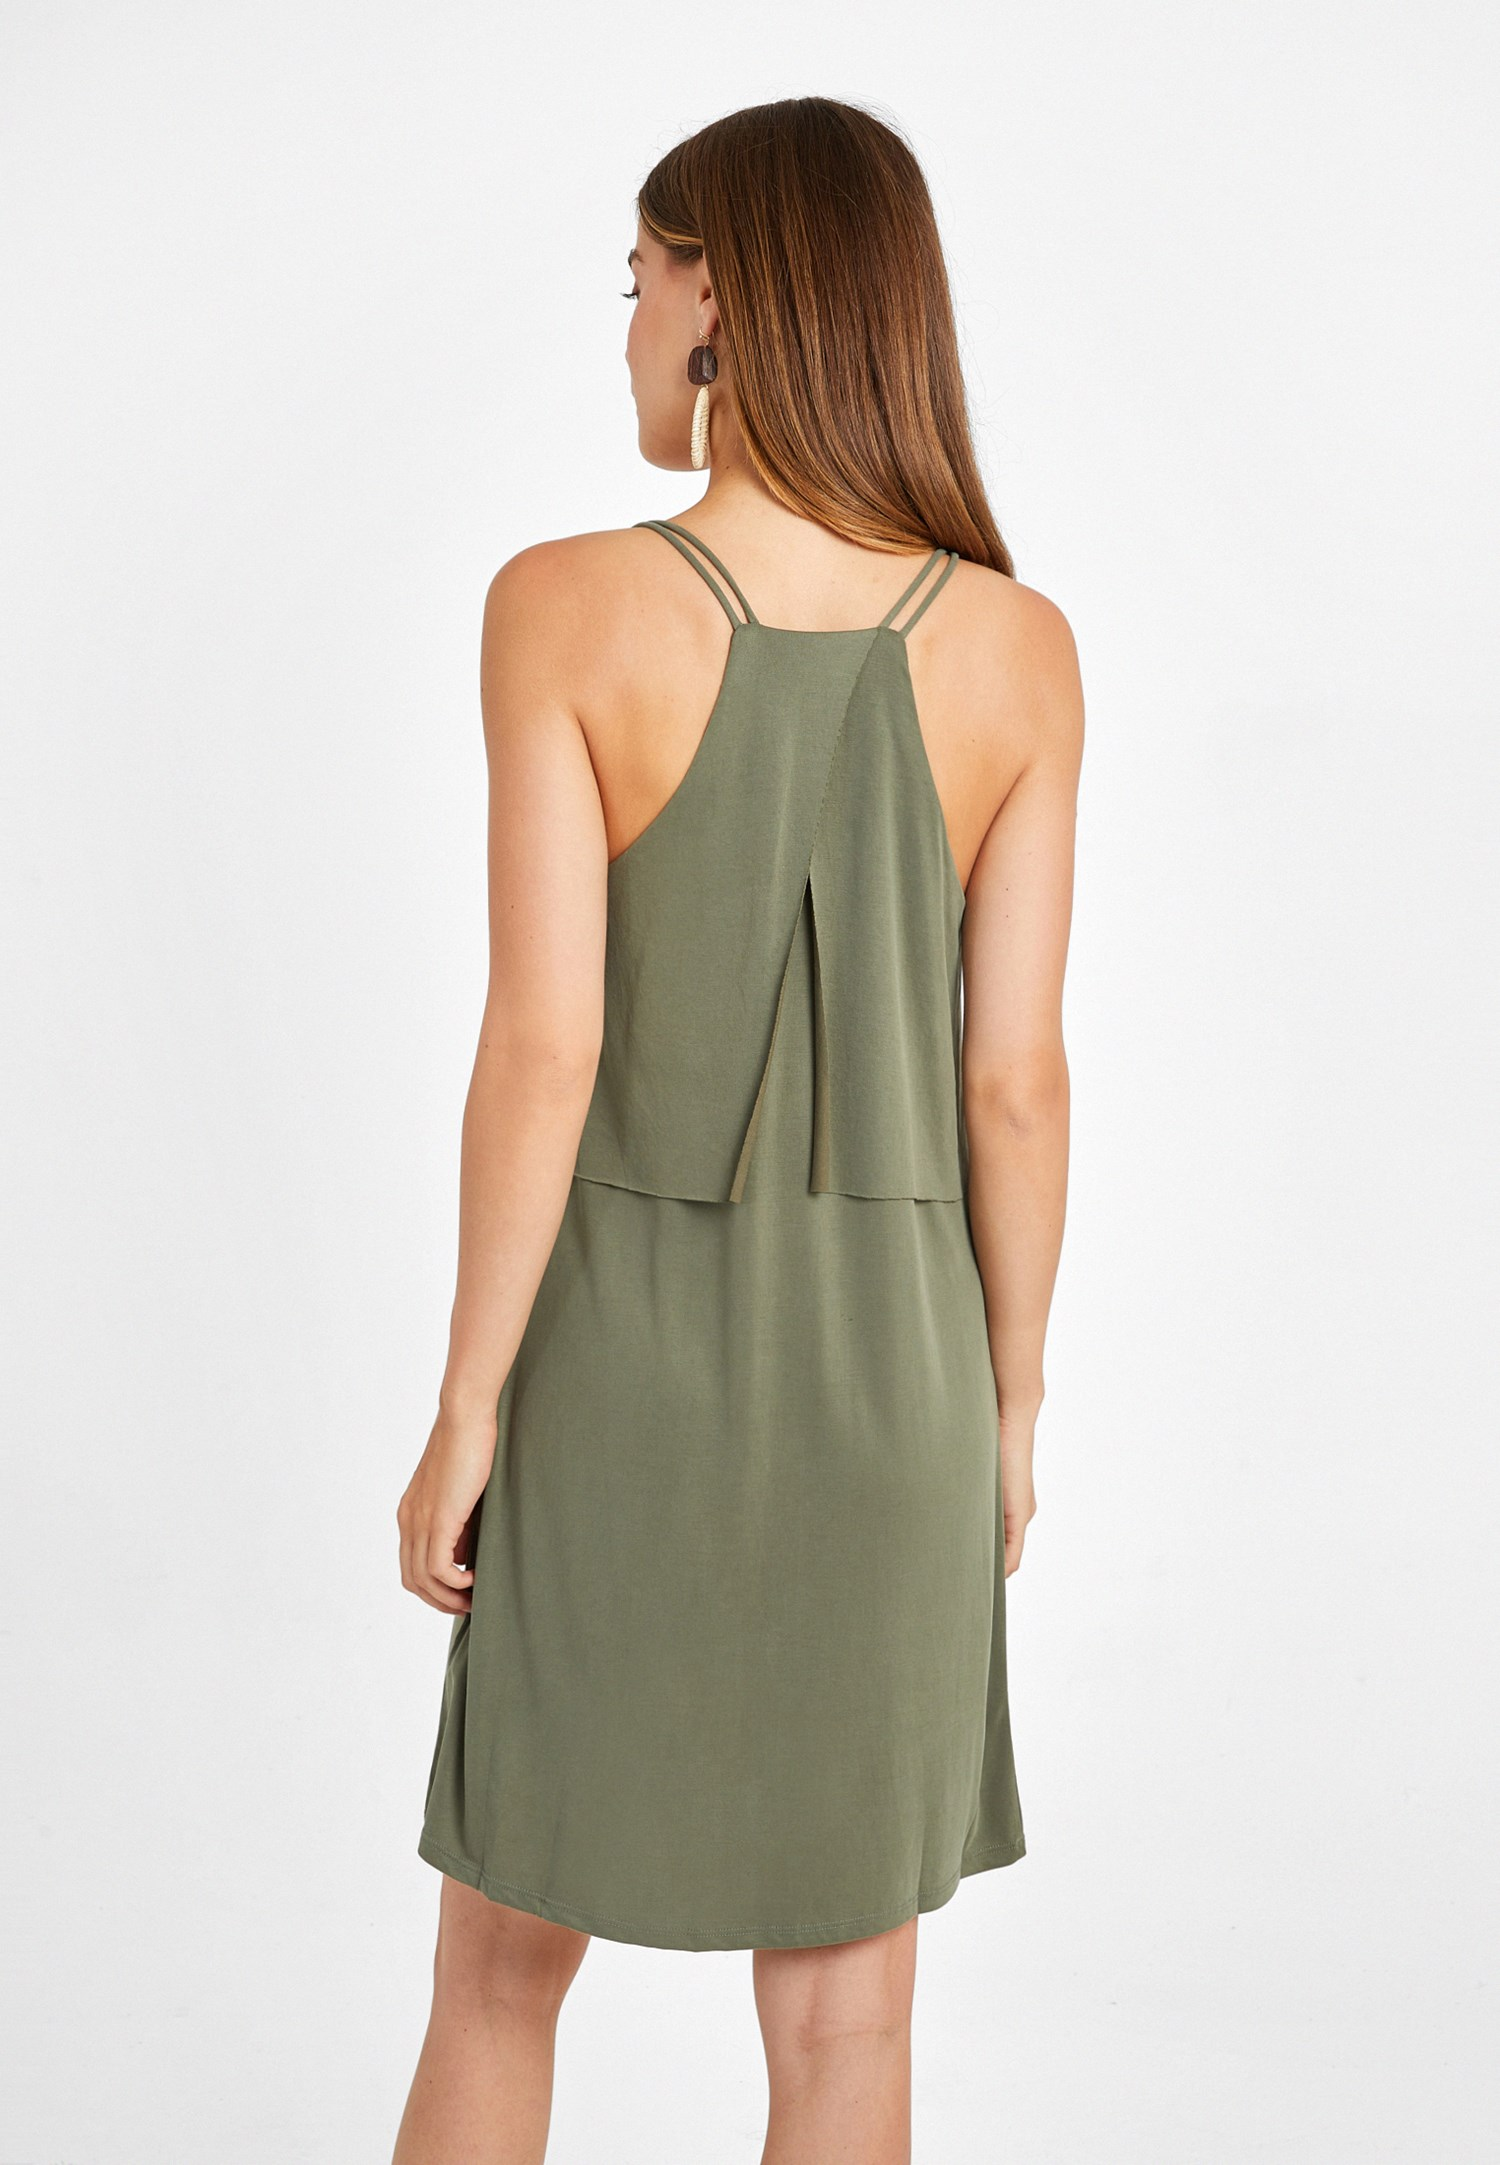 Bayan Yeşil Yumuşak Dokulu V Yaka Elbise